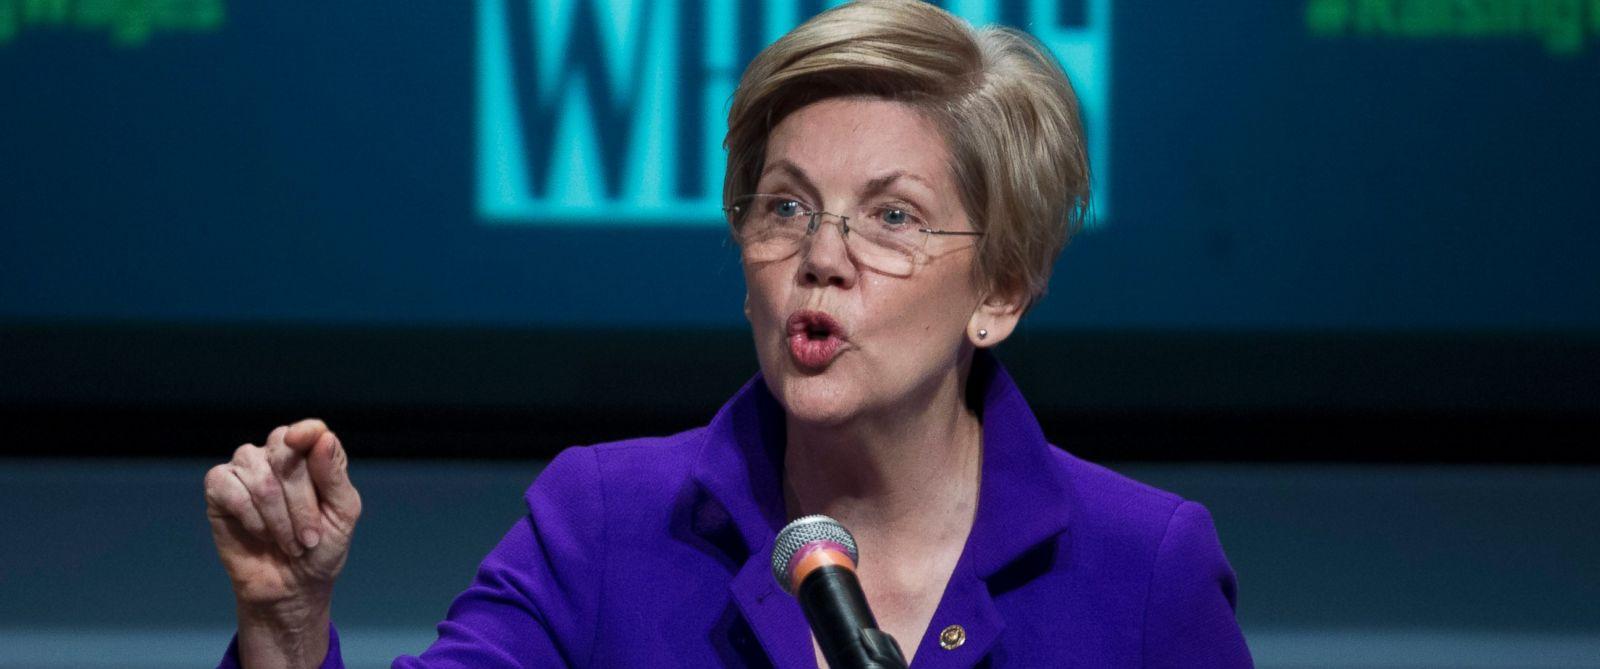 PHOTO: Sen. Elizabeth Warren, D-Mass. speaks about raising wages during the forum AFL-CIO National Summit, on Jan. 7, 2015, at Gallaudet University in Washington.